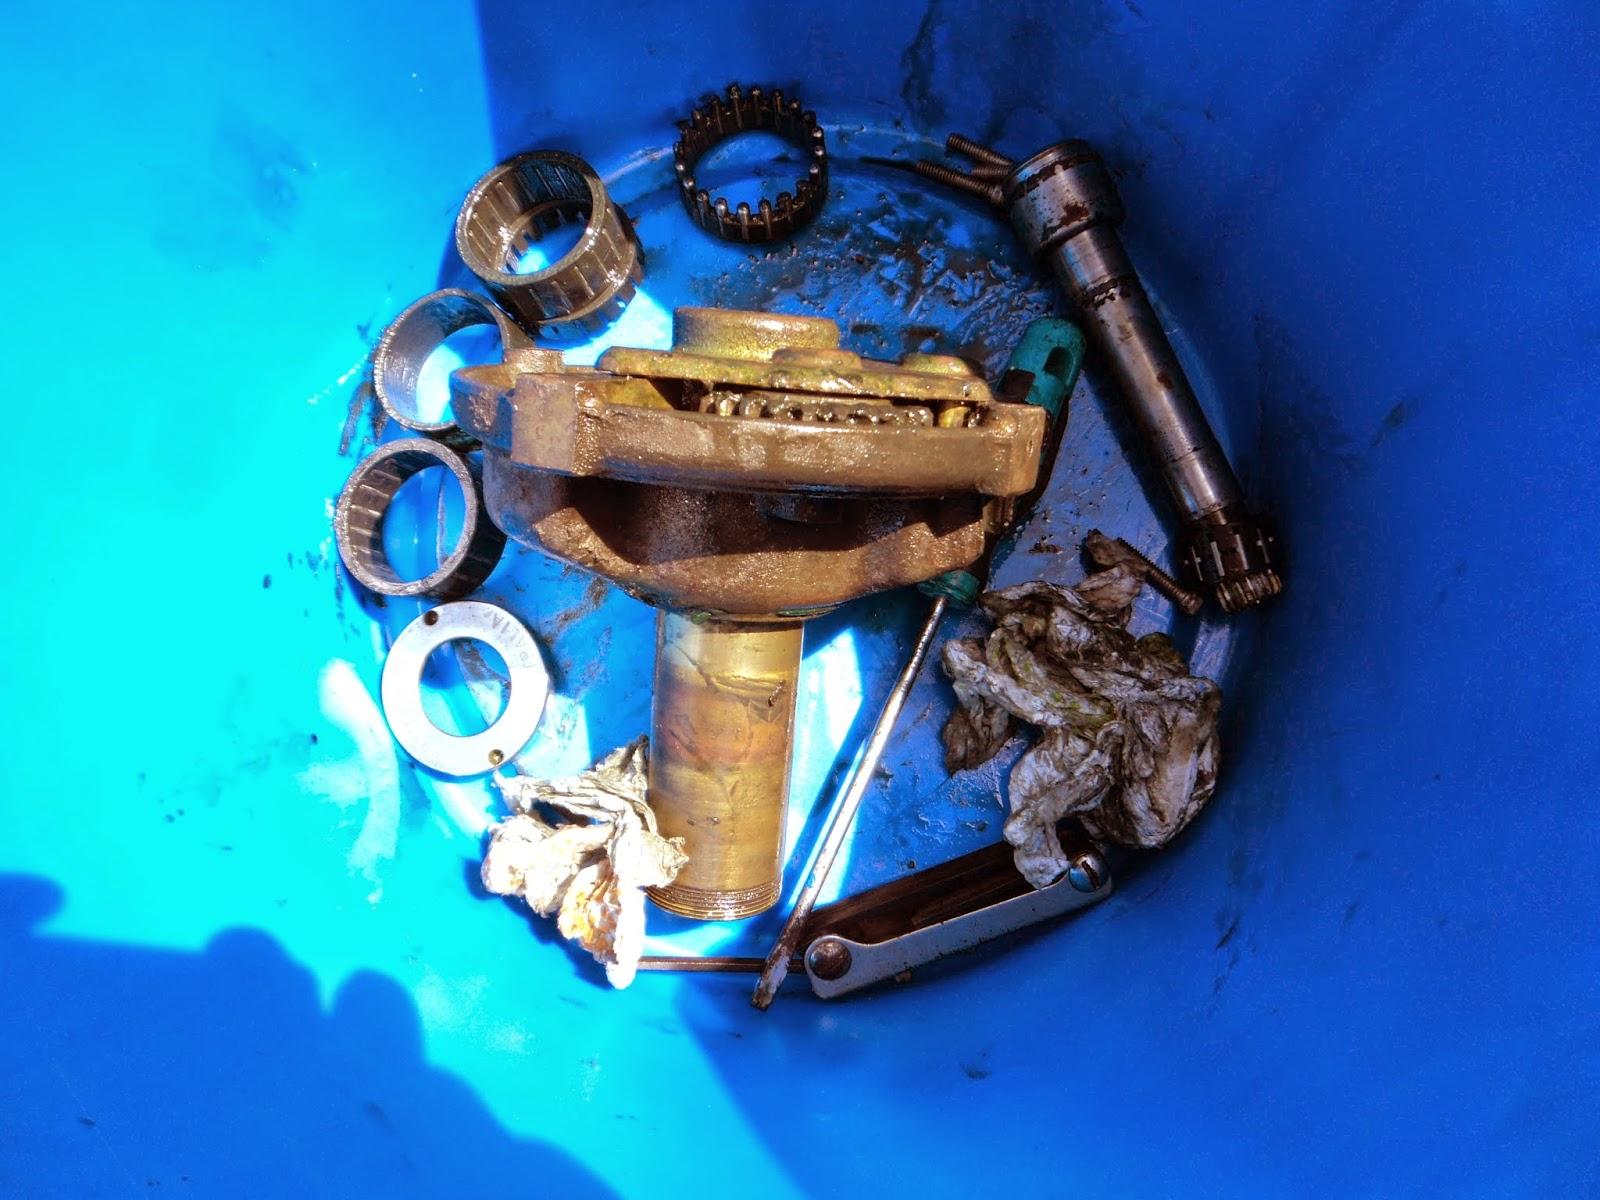 Barlow 28 winch parts